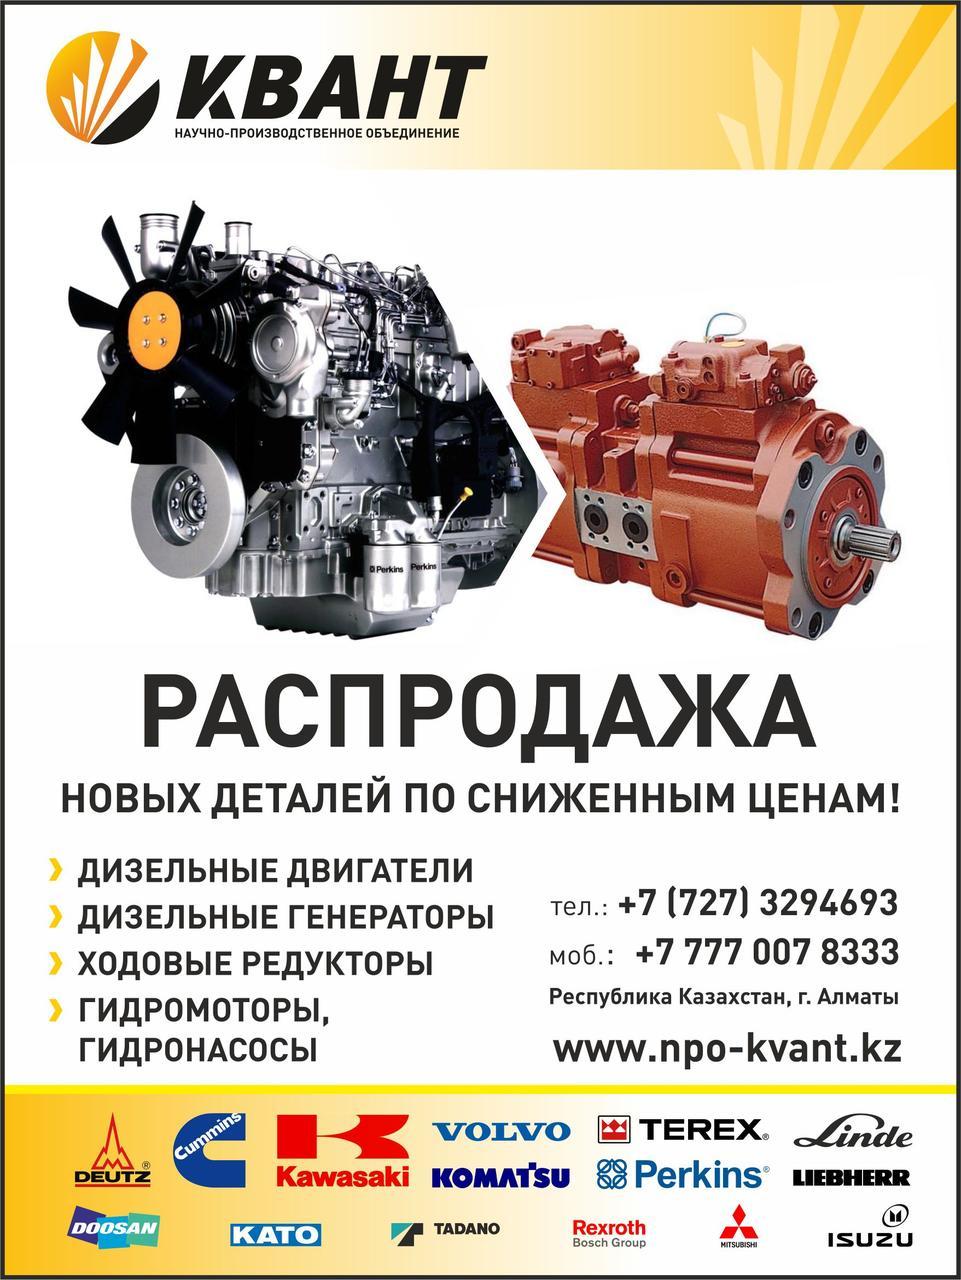 Двигатель Iveco 8360SRC21, Iveco 8360SRC22, Iveco 8360SRC46, Iveco 8361, Iveco 8361M16, Iveco 8361SM21